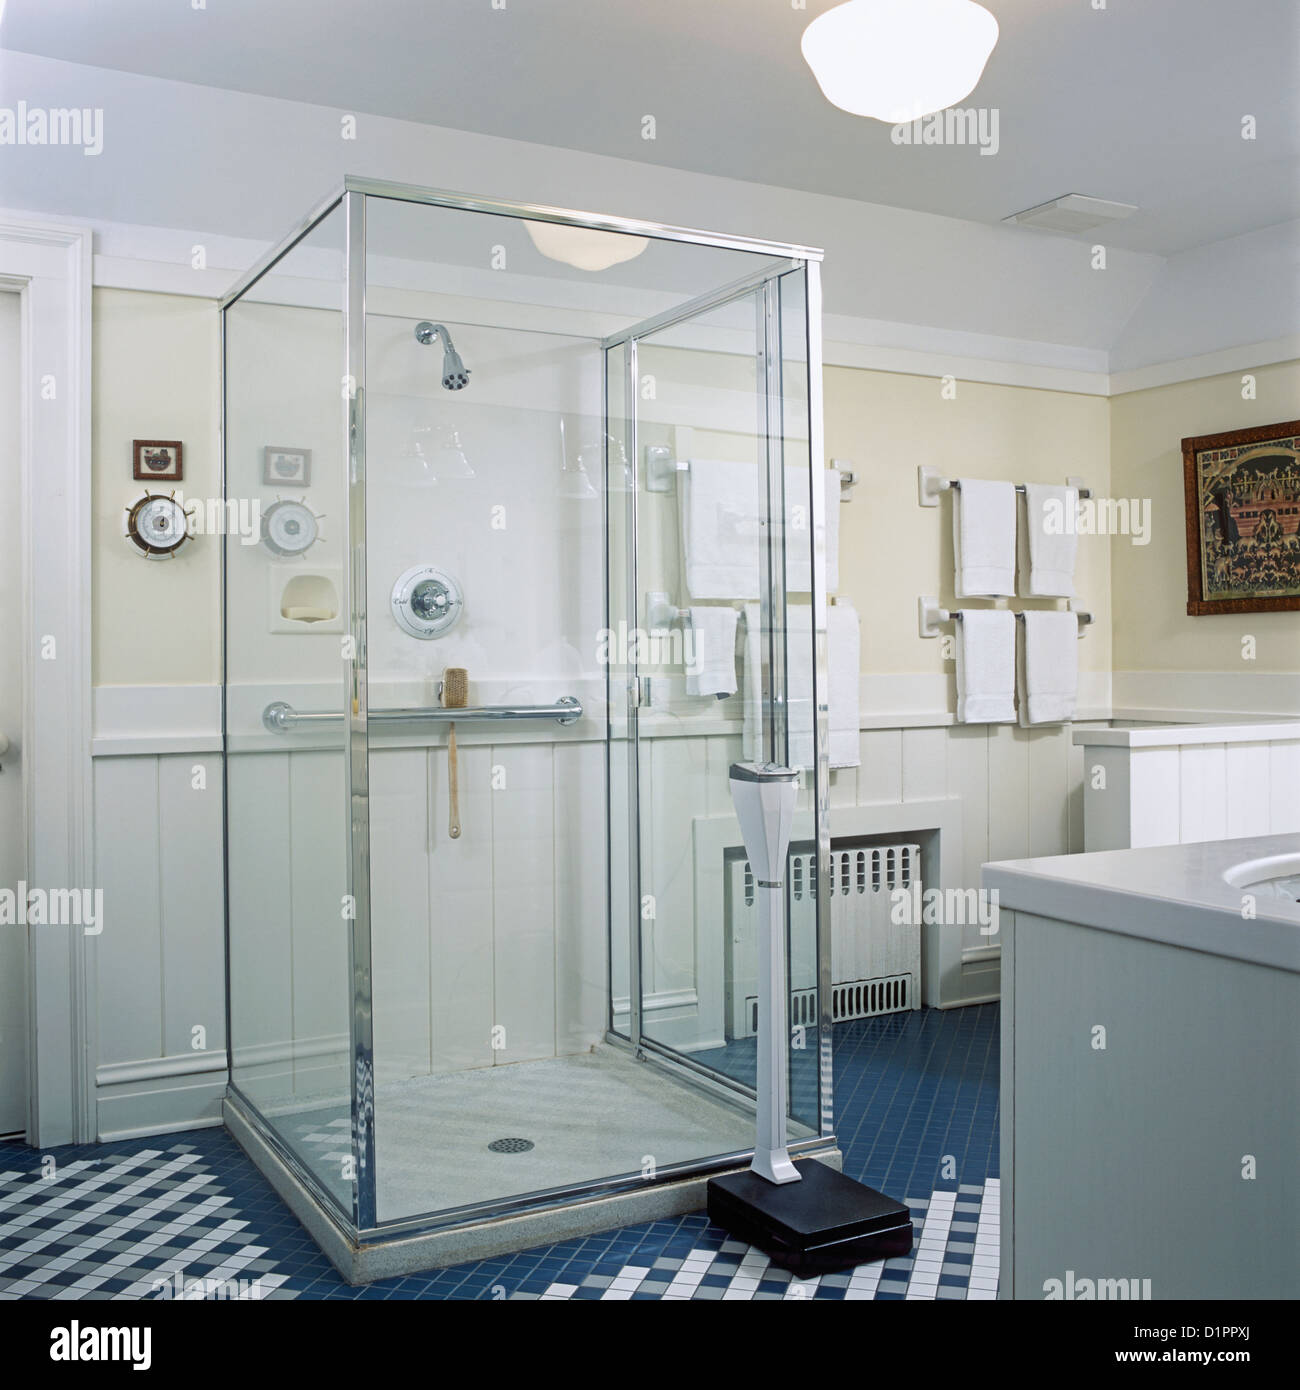 Badezimmer Blick Richtung Glas Box Dusche stand, Petrol / blau ...